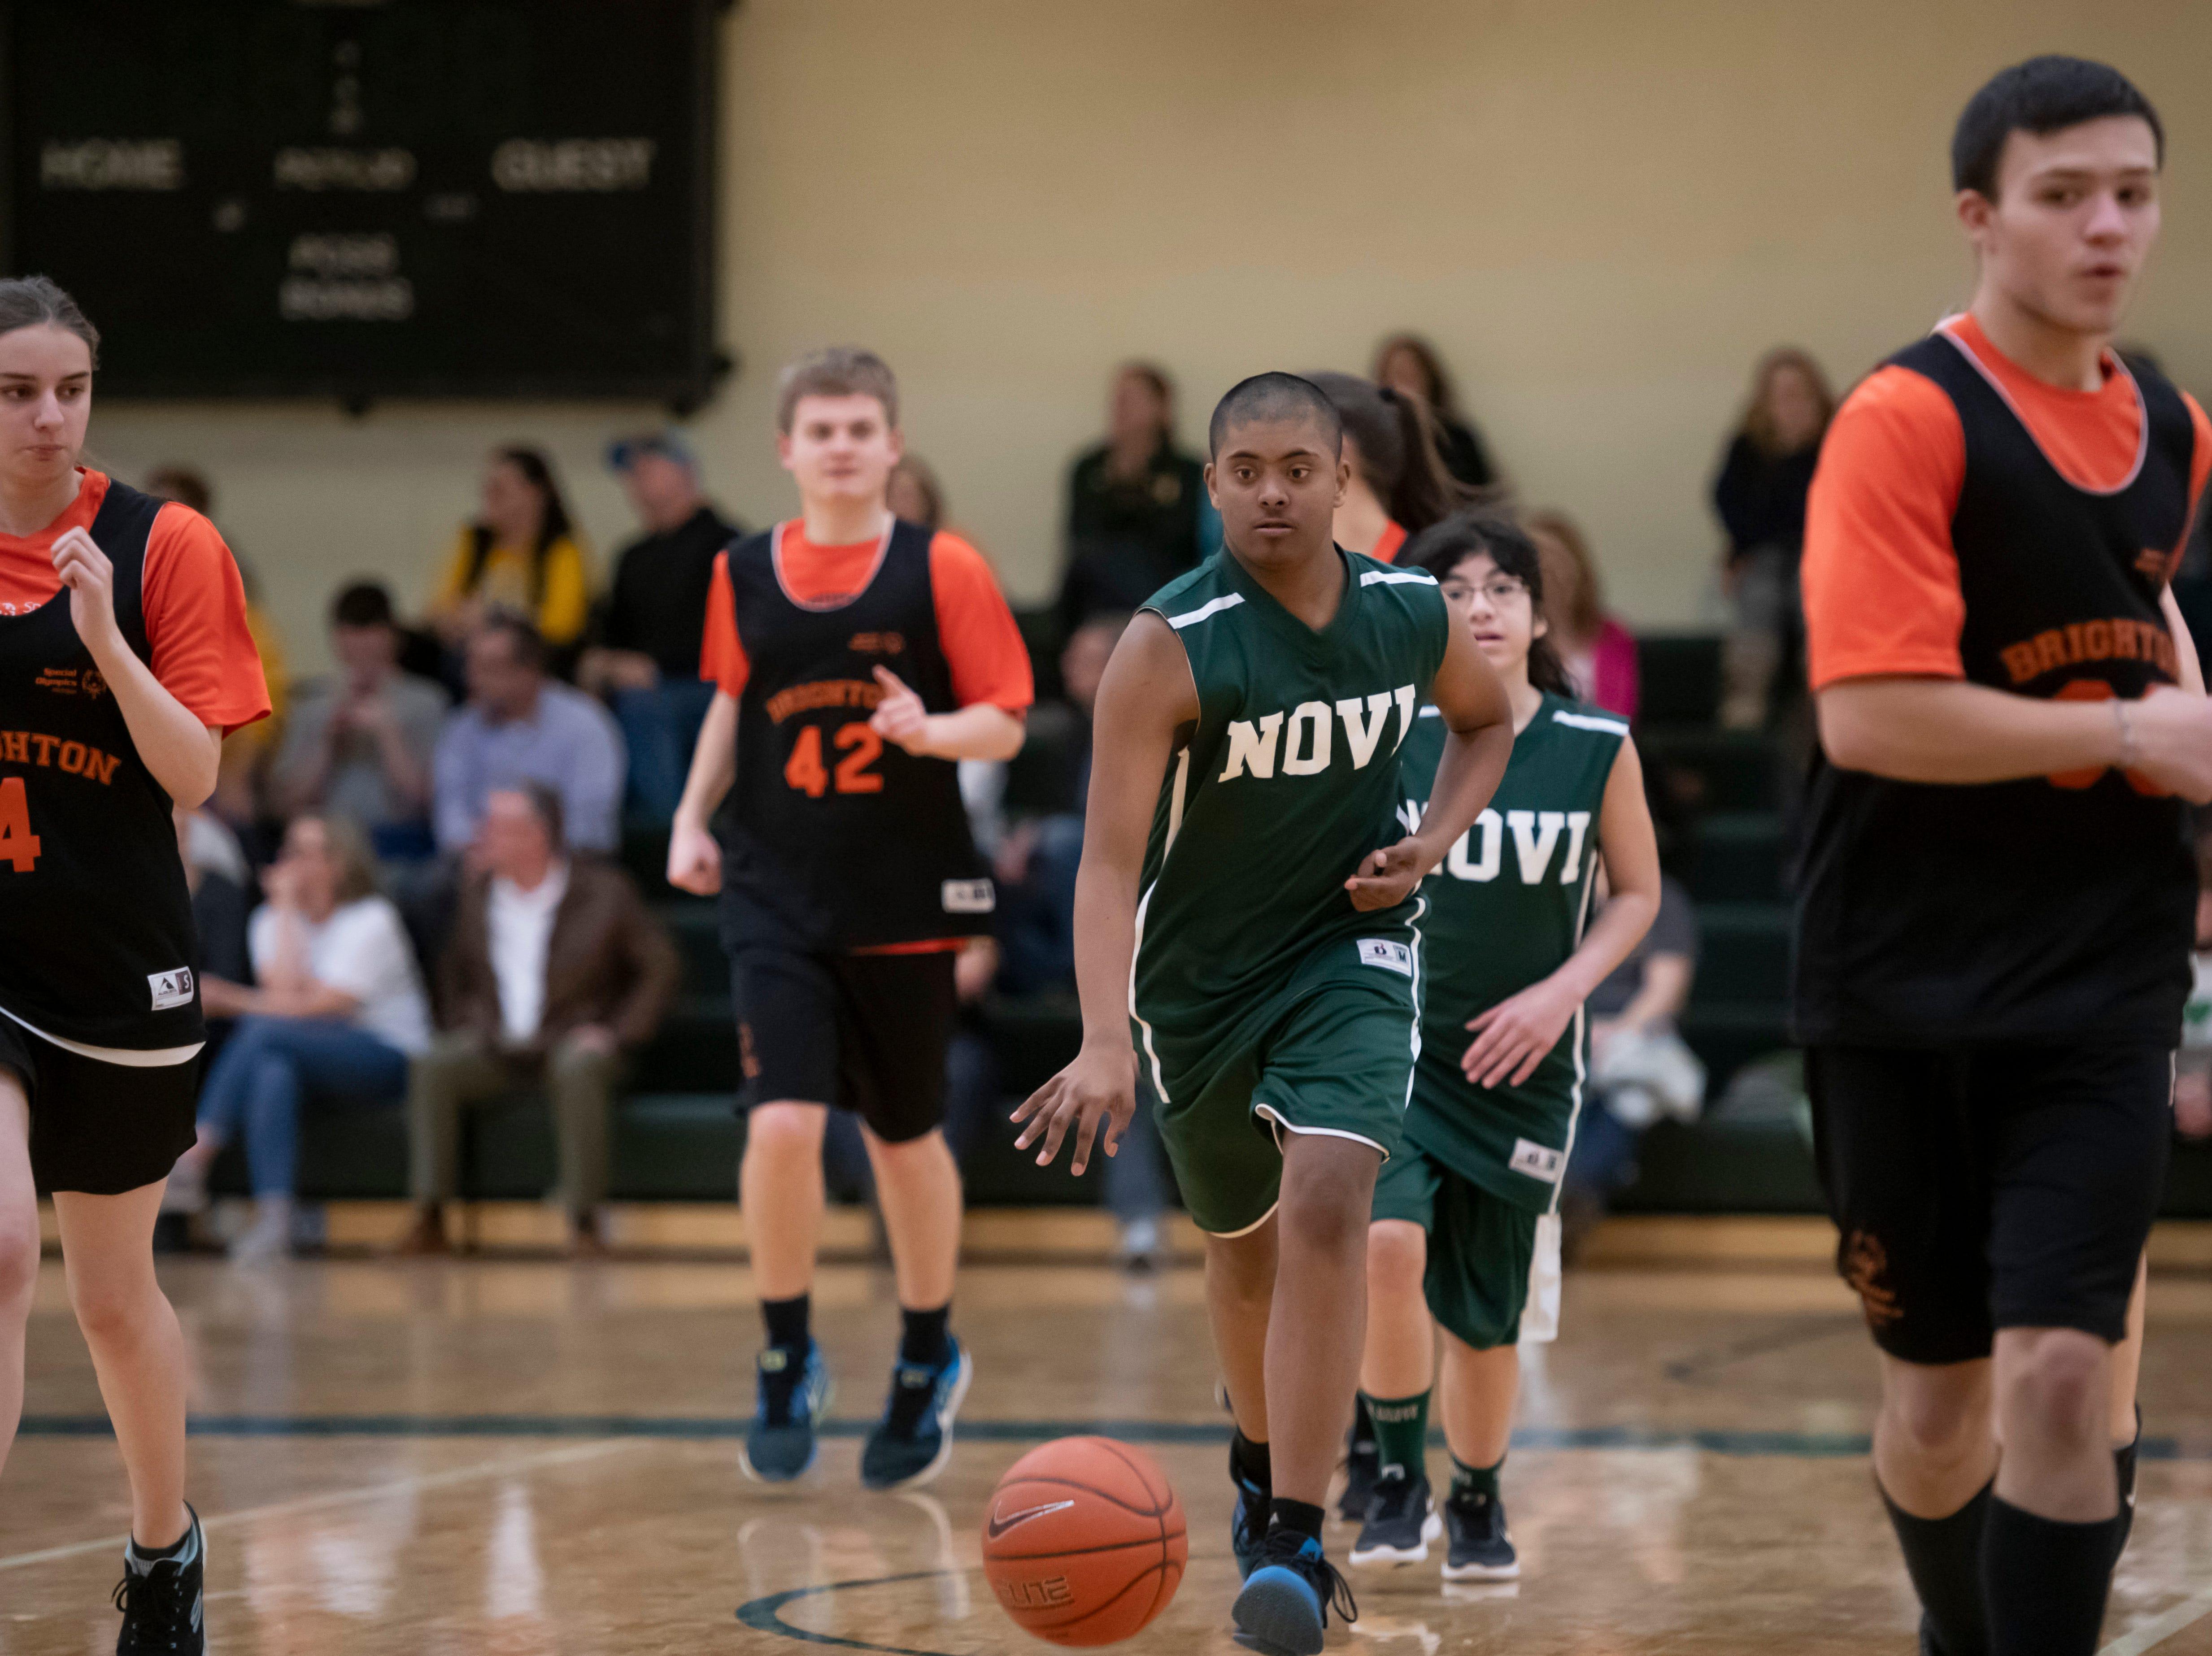 Novi's Sujay Kolli runs the ball up the court against Brighton during the Kensington Lakes Athletic Association Unified basketball tournament at Novi high school.